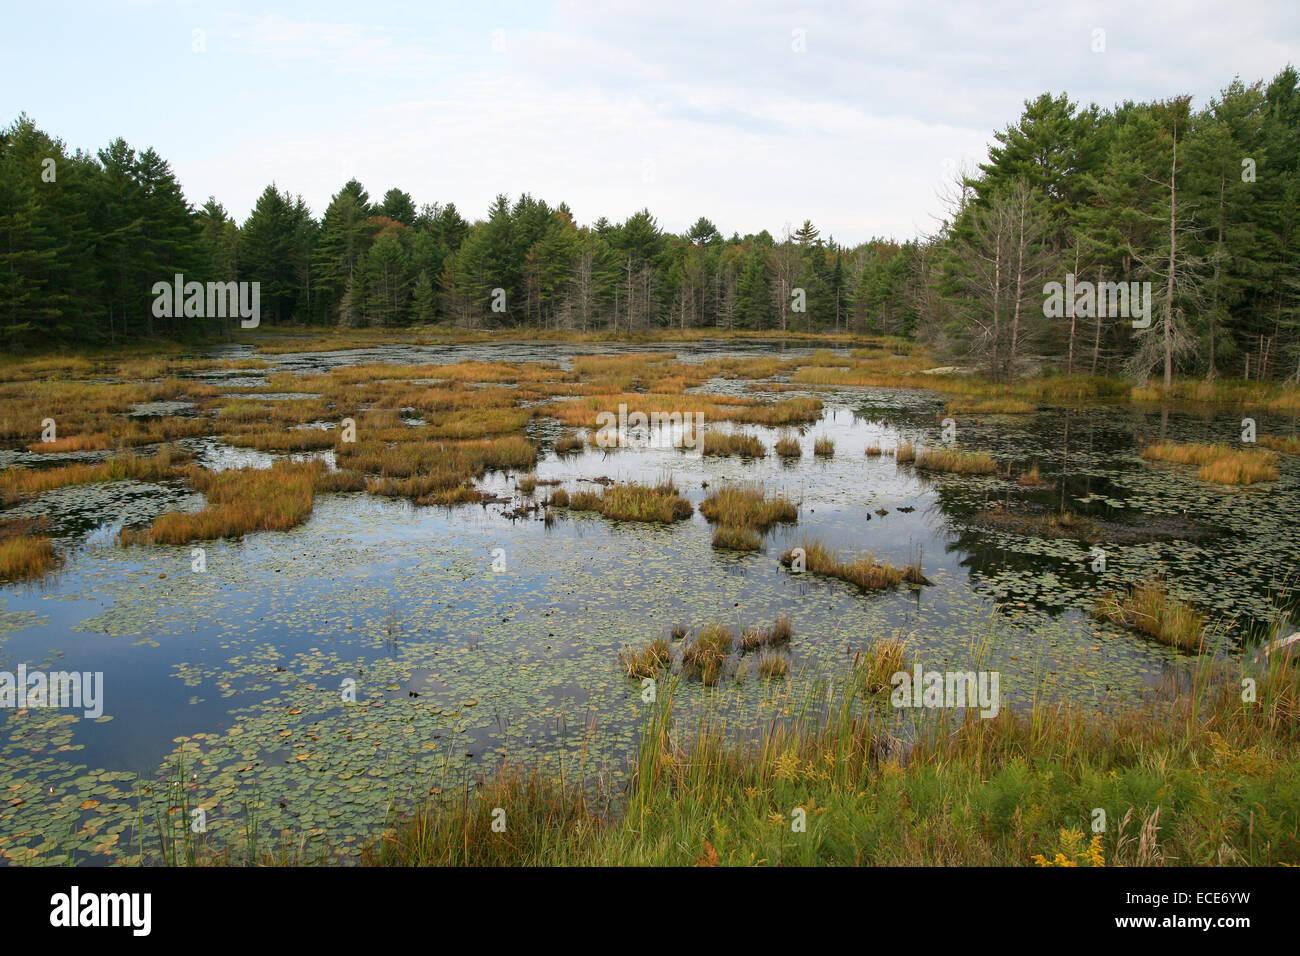 Sumpf Sumpflandschaft Suempfe See Seen Kanada Canada Canadian Baum einzeln Gras Graeser Baeume Pflanze Pflanzen - Stock Image